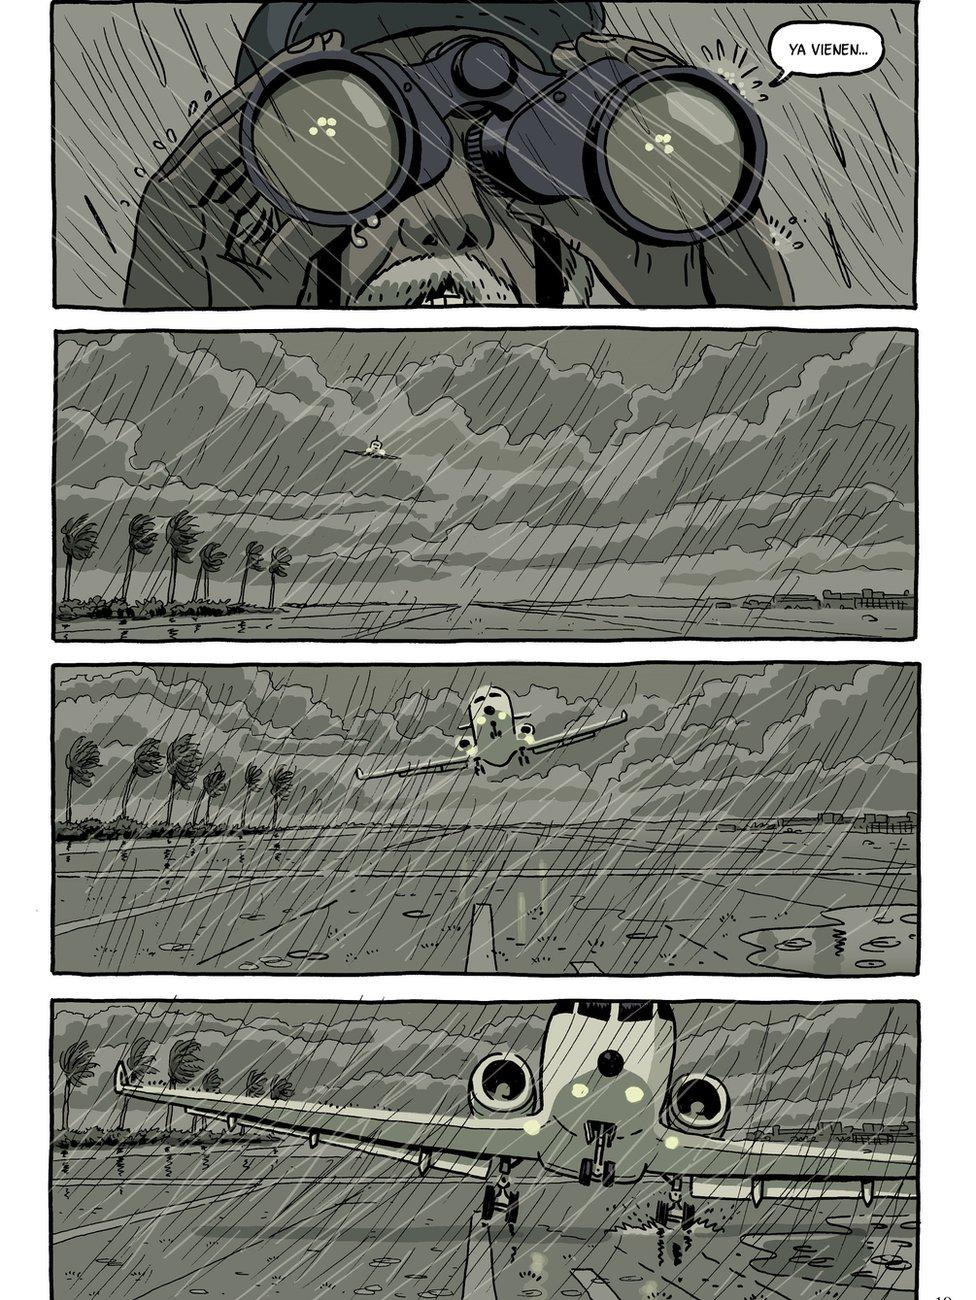 One strip illustrates a plane landing